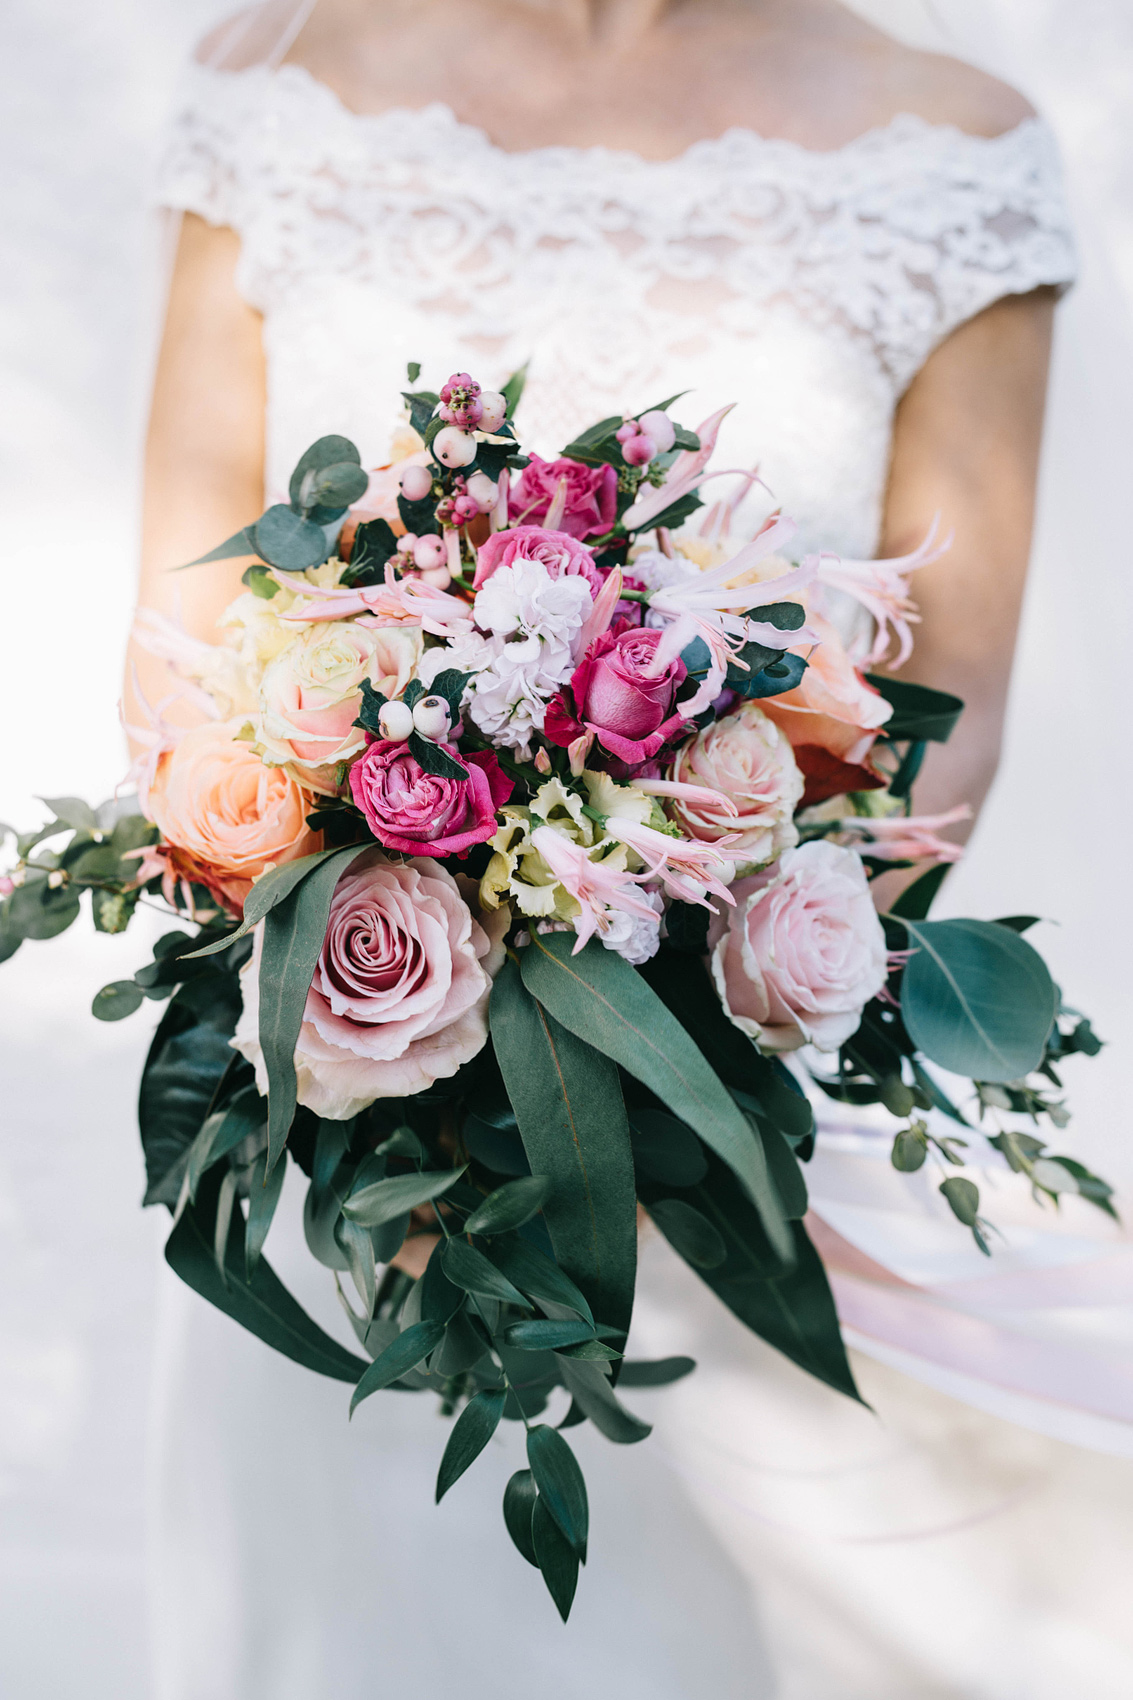 Claire_Basiuk_Richmond_Park,_London_Wedding_Photography_-17.jpg